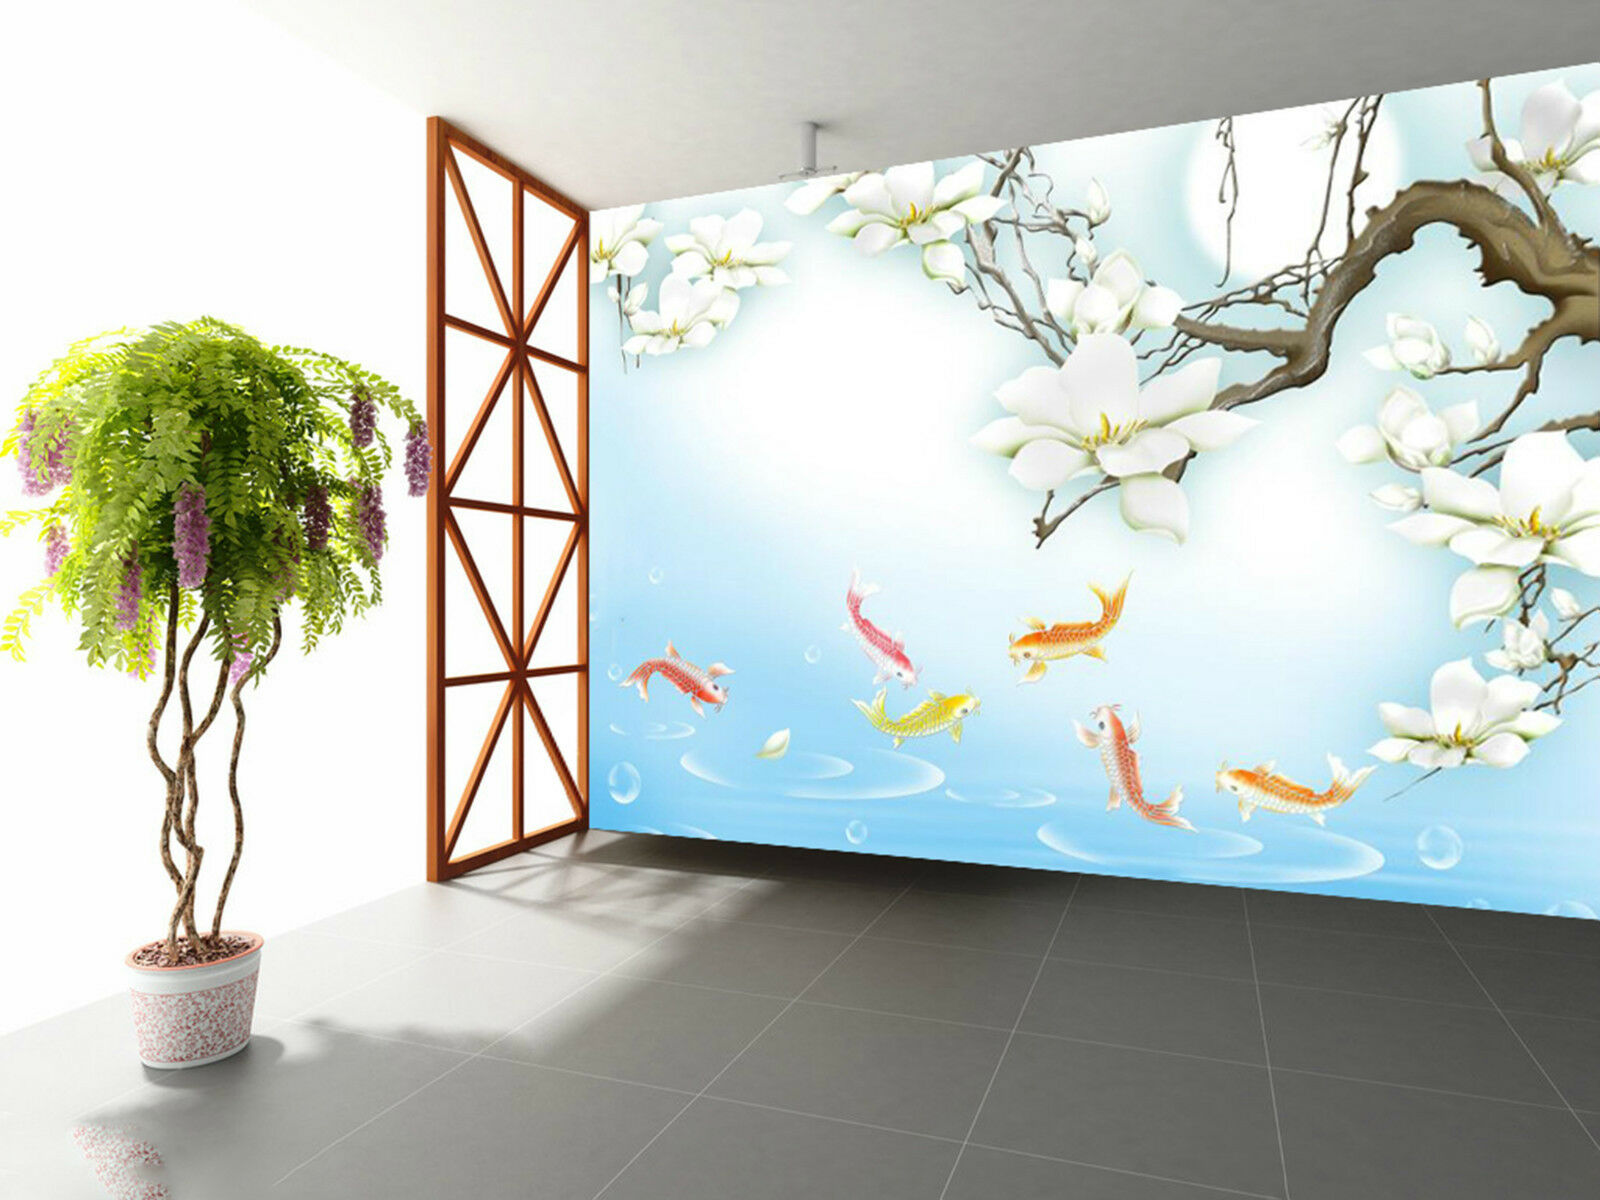 3D Hintergrund 253 Fototapeten Wandbild Wandbild Wandbild Fototapete Bild Tapete Familie Kinder DE 128693